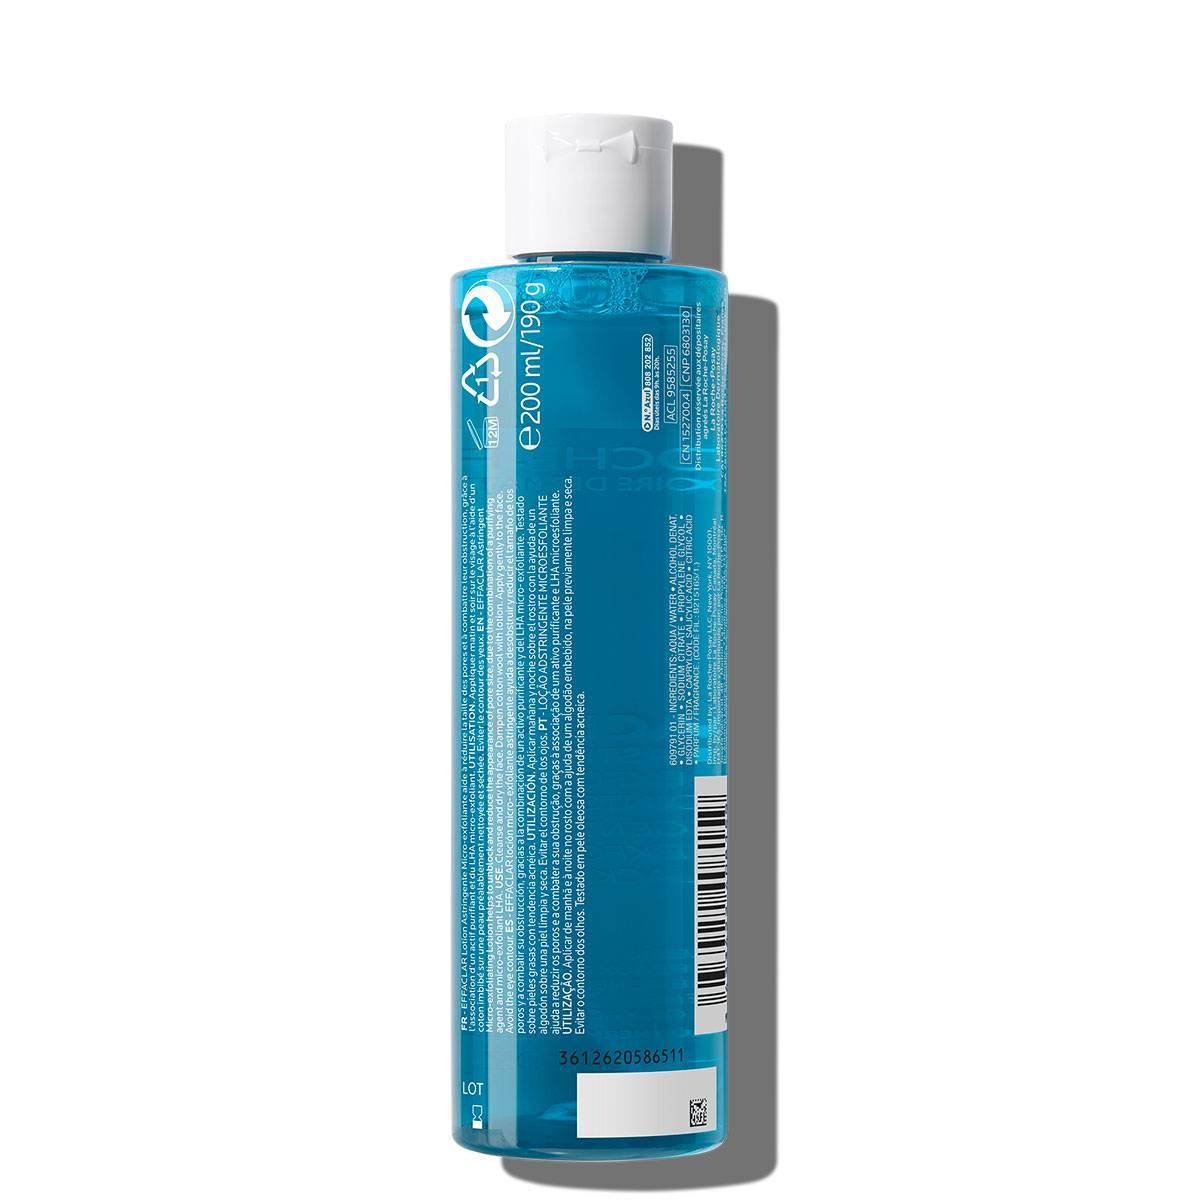 La Roche Posay Kasvojenhoito Effaclar Micro Exfoliating Astringent Toner 2